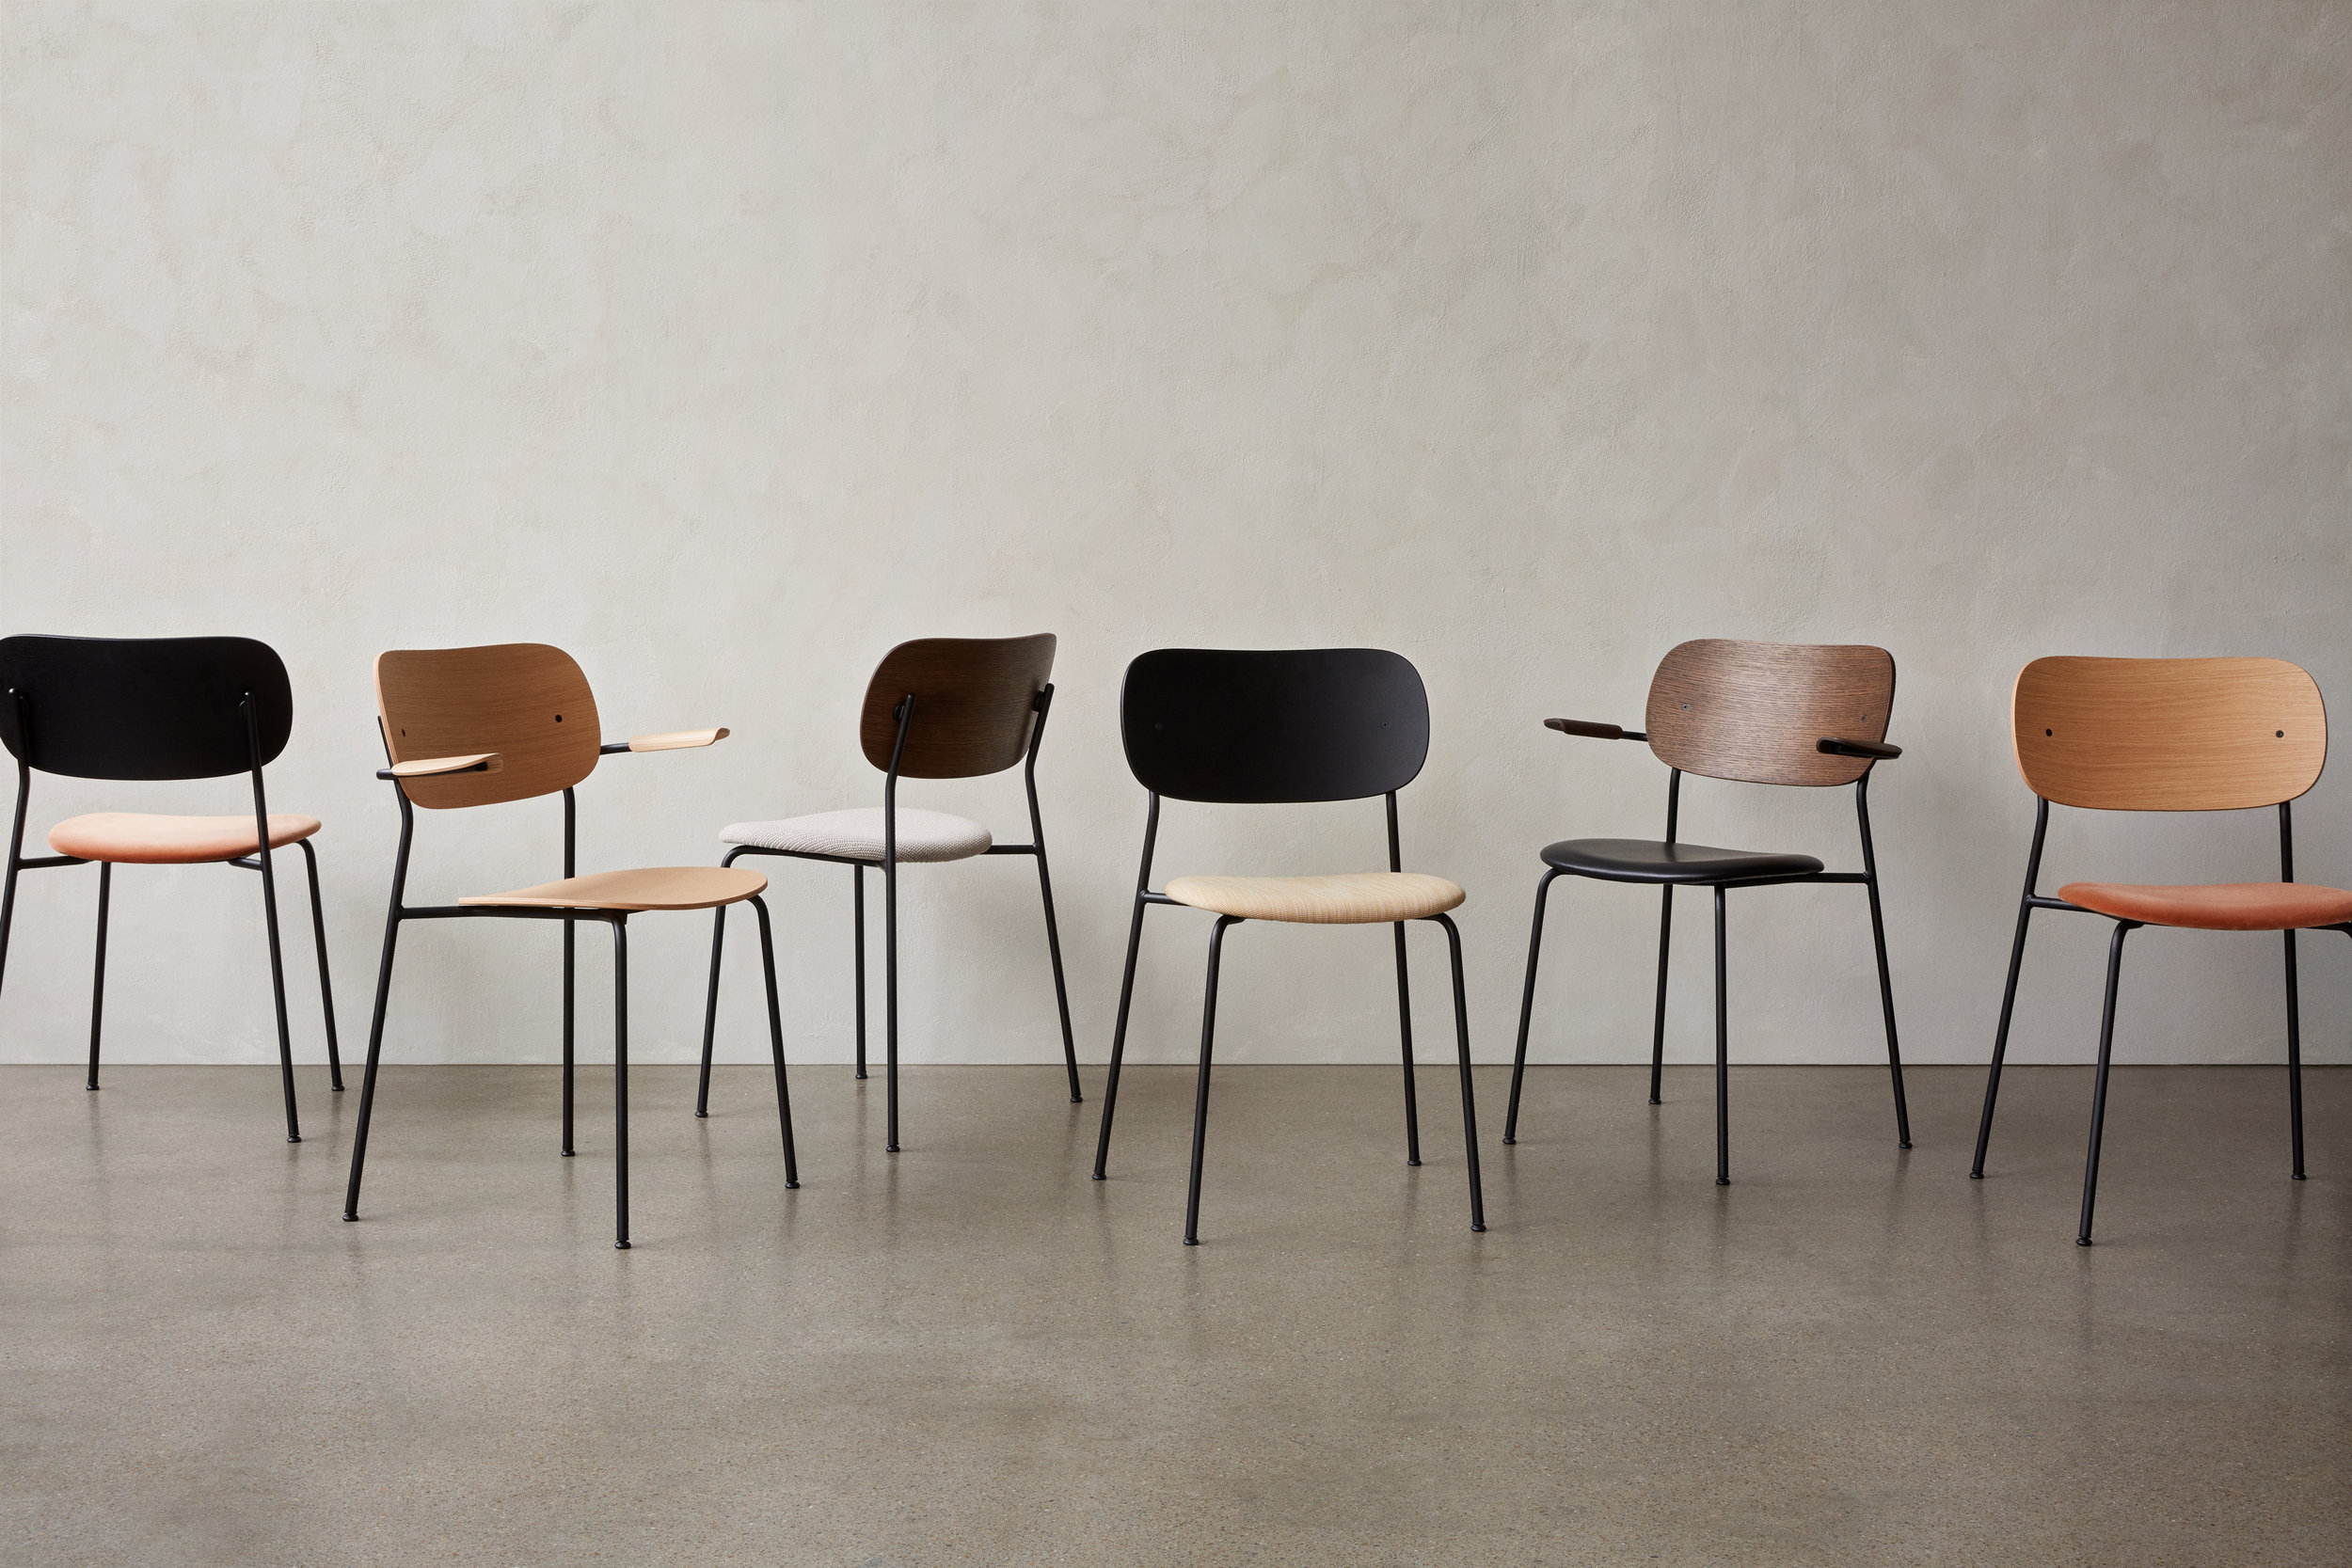 co design office chairs knee support chair meet the perfect crioll lab menu modern furniture scandinavian home